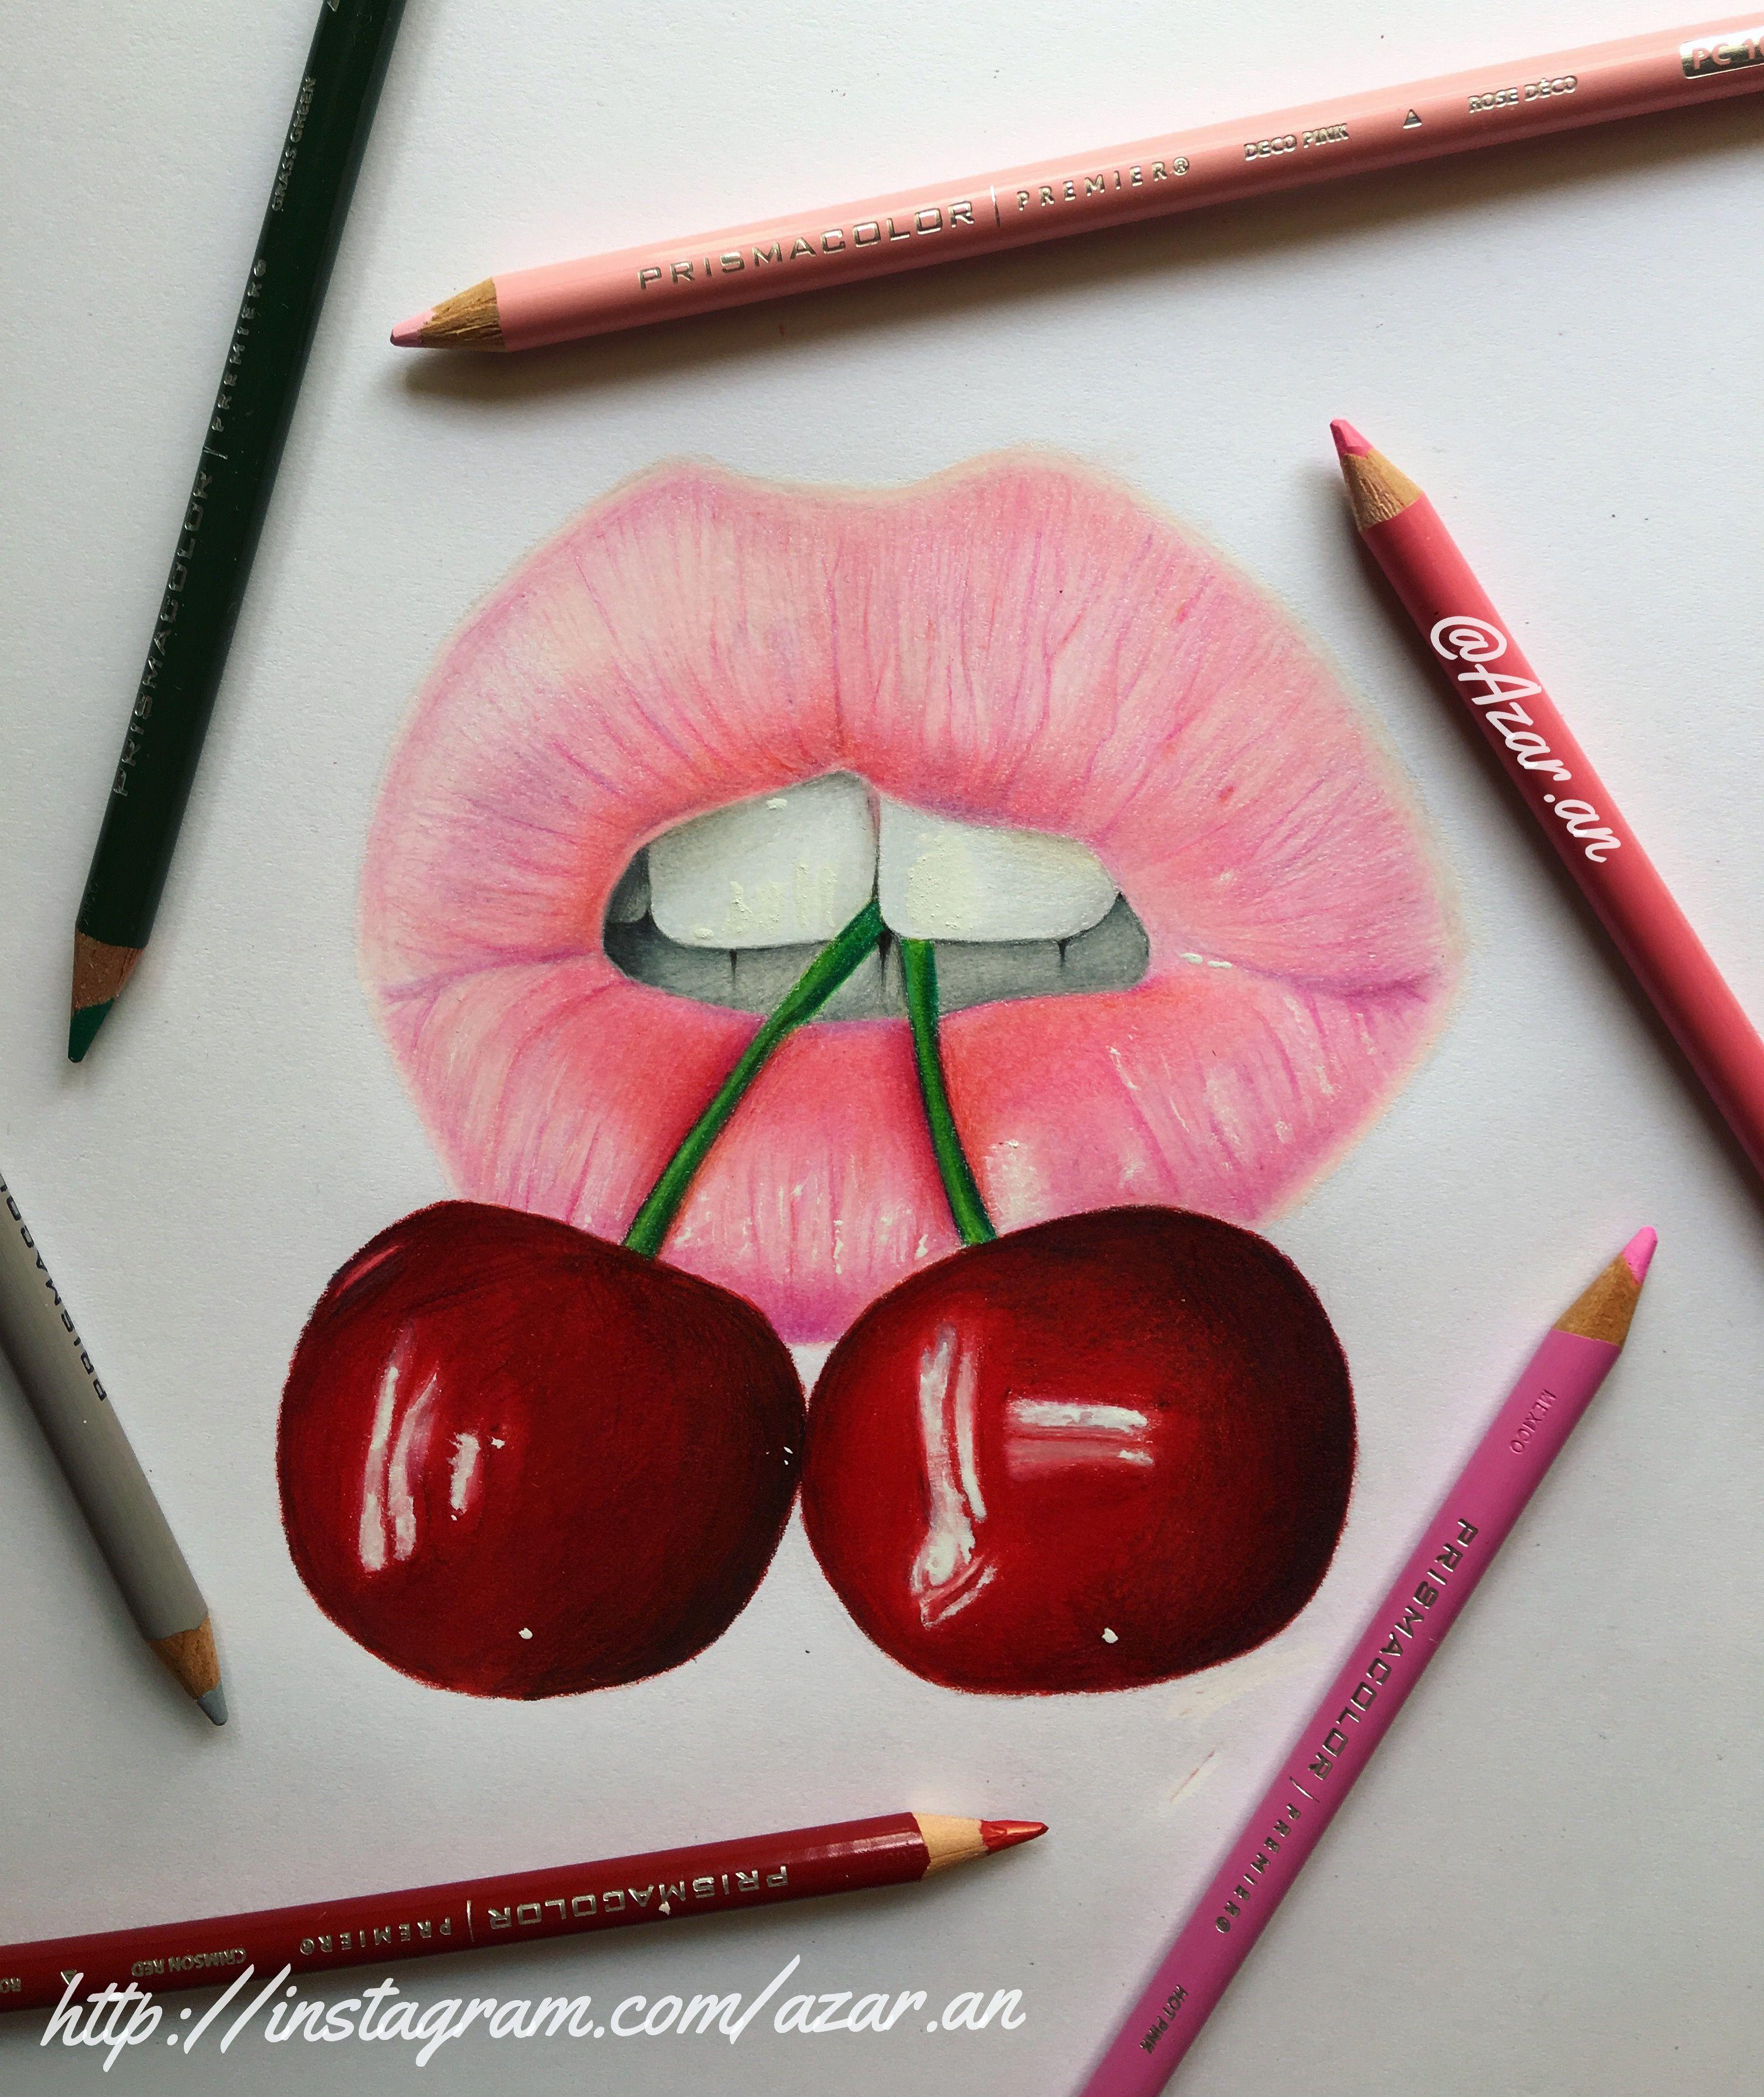 3024x3595 Colored Pencil Lip Drawing Azar.an Arts Coloured